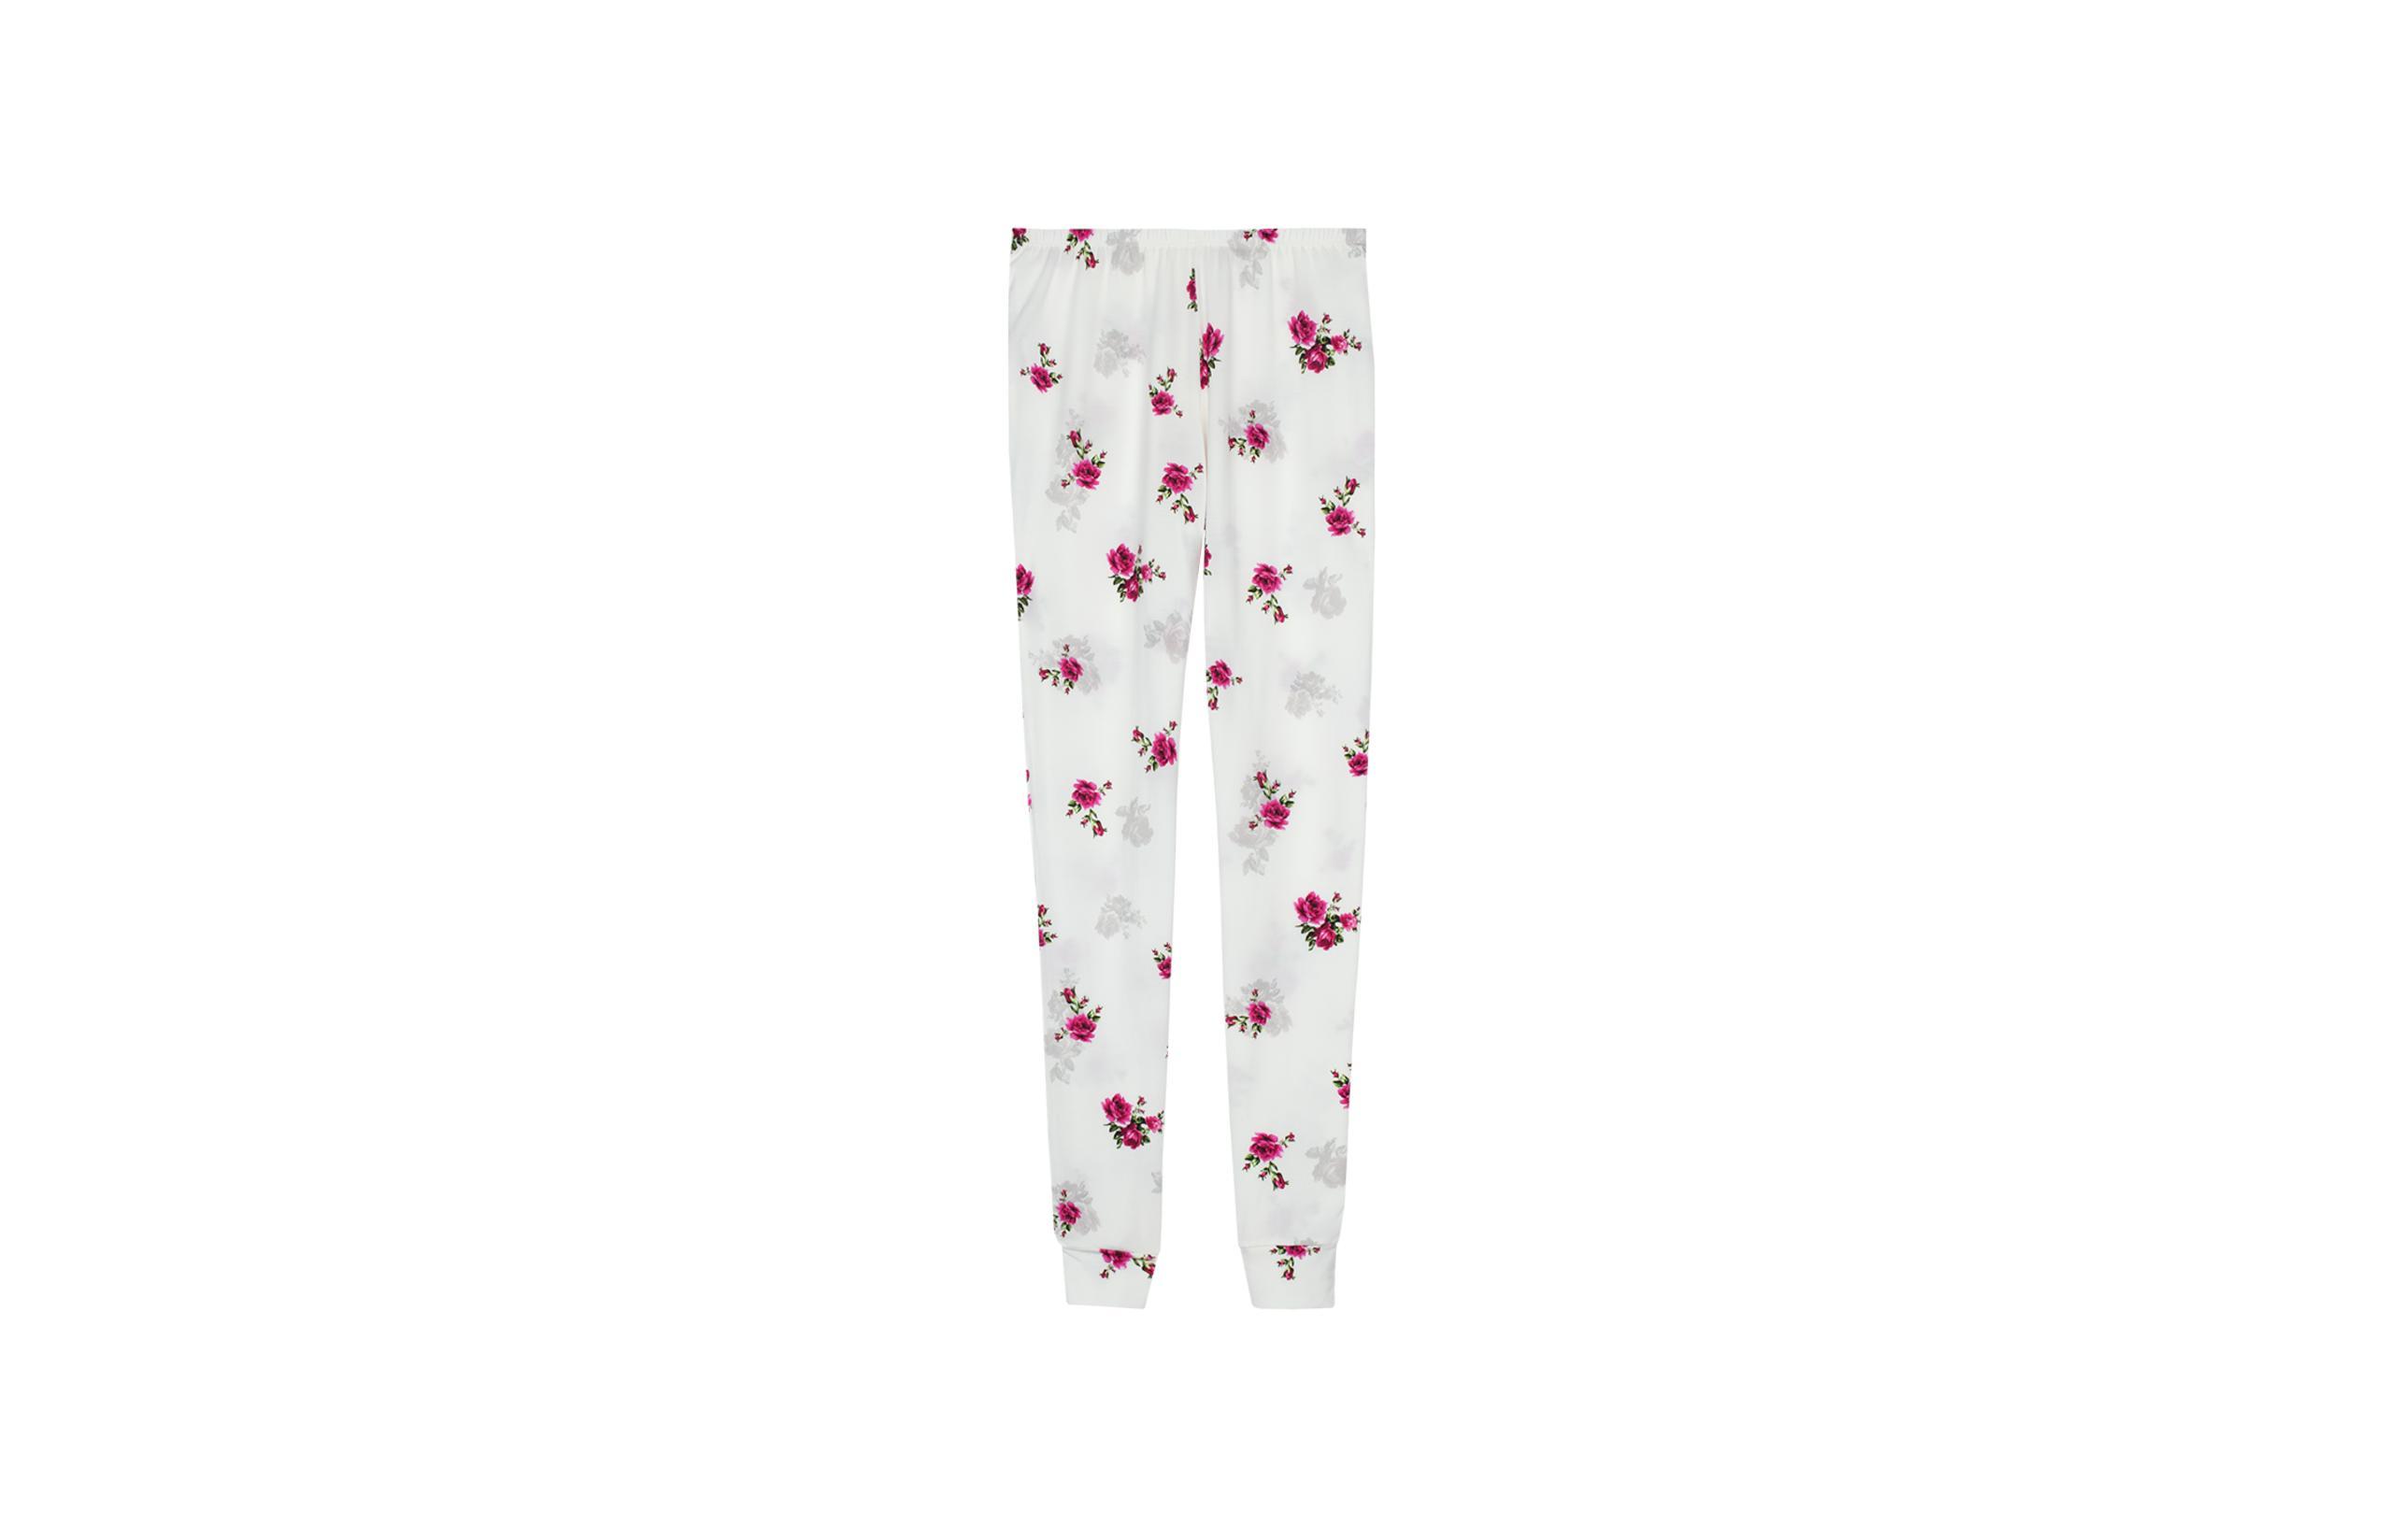 intimissimi - Lange Hose aus Mikromodal Print Rose Degradè